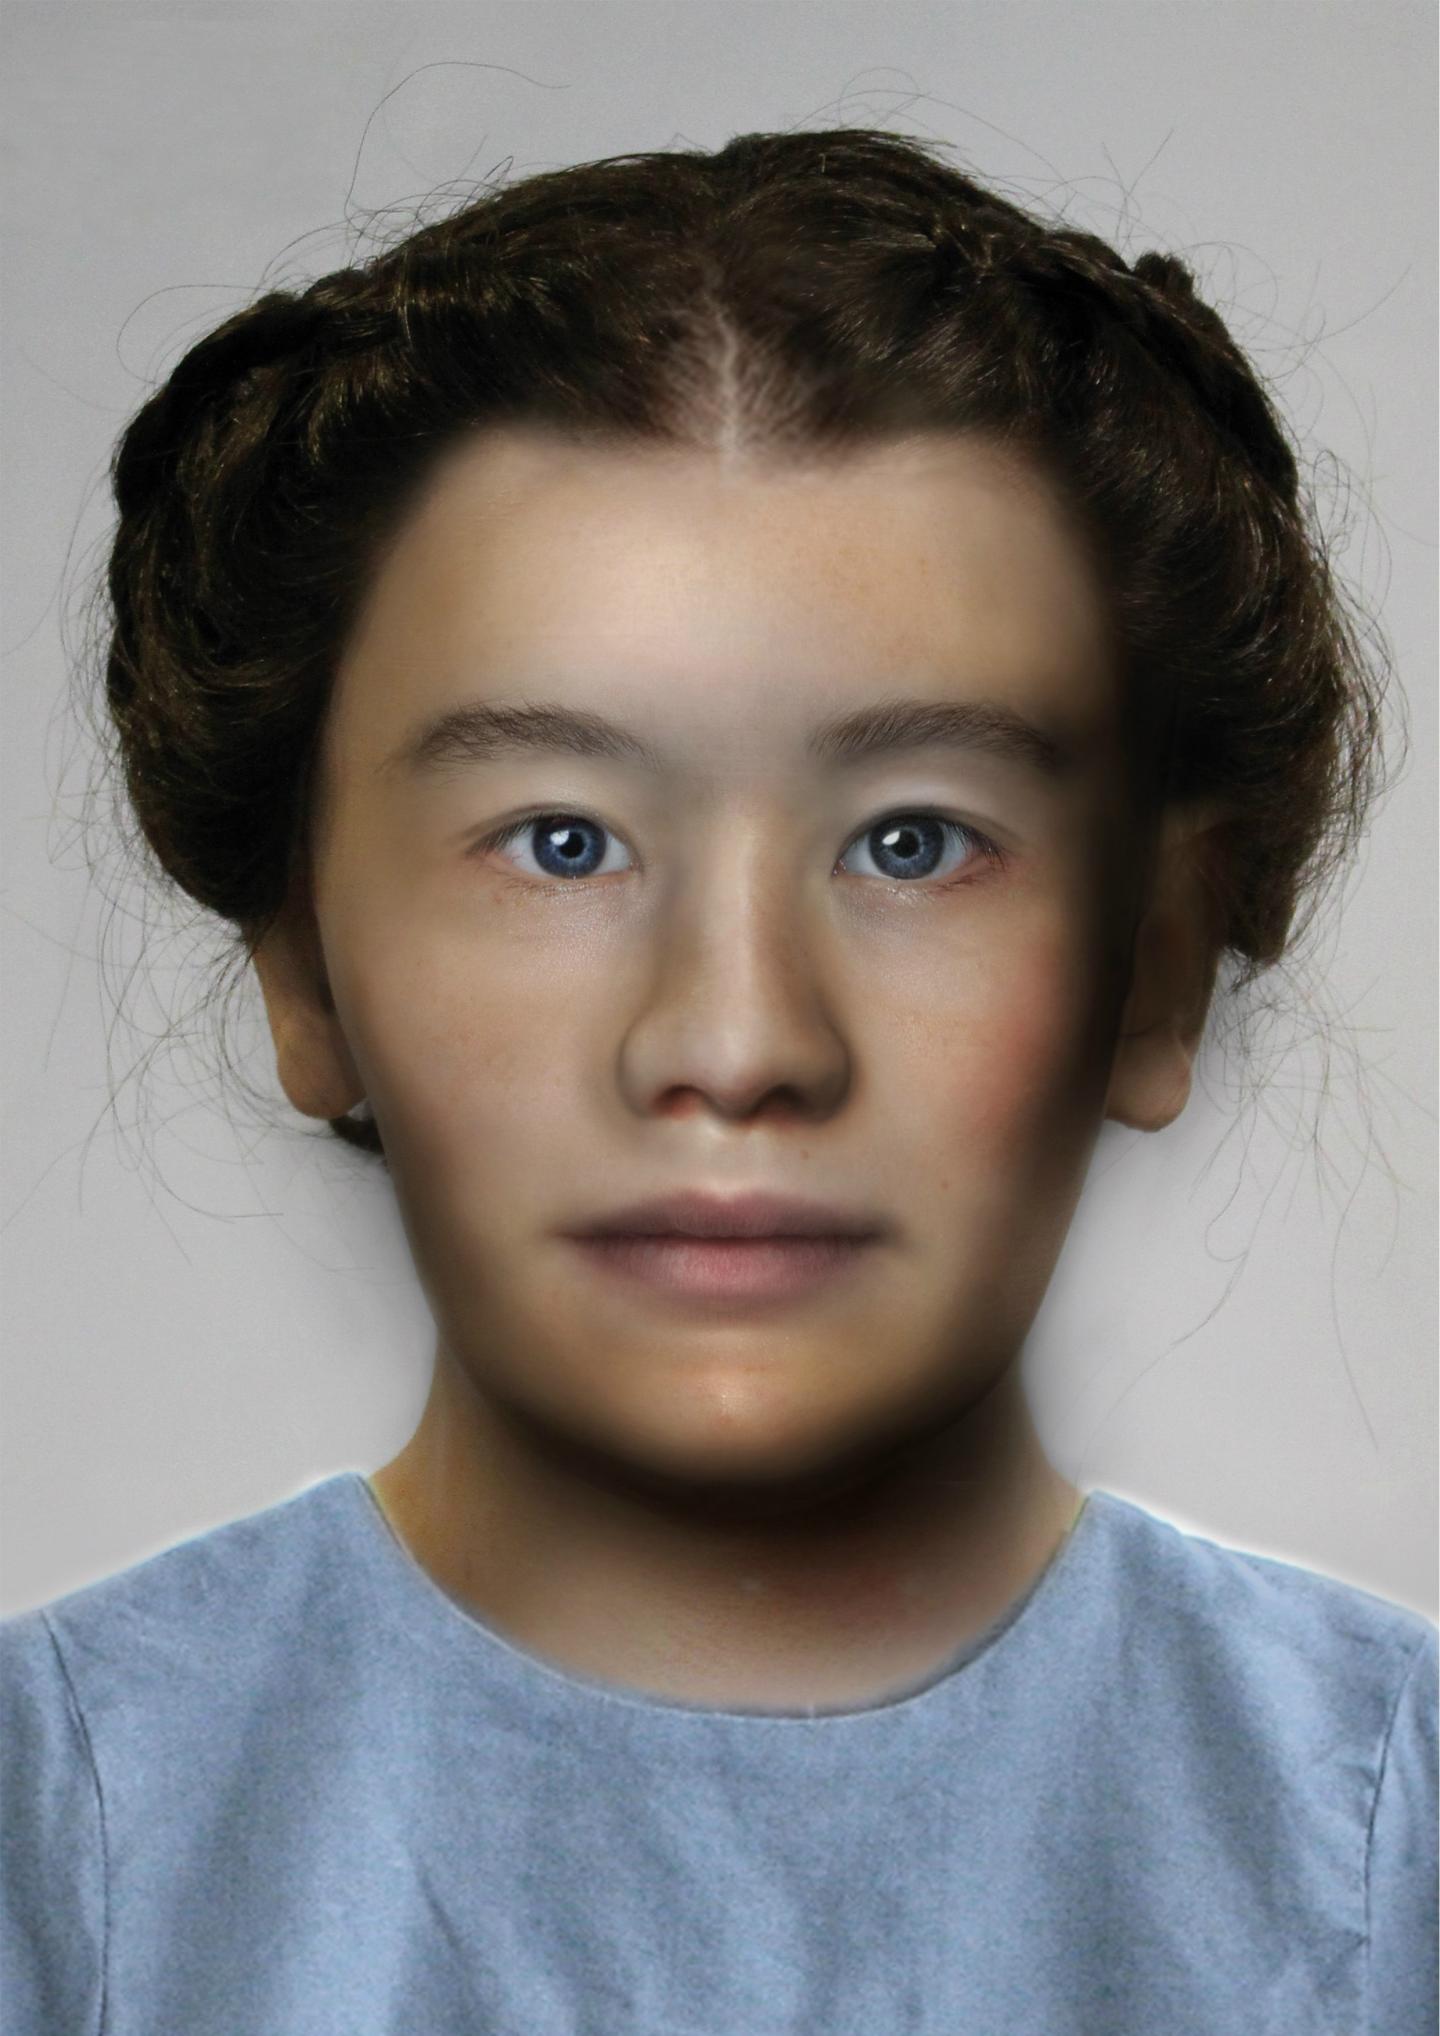 Face Reconstruction